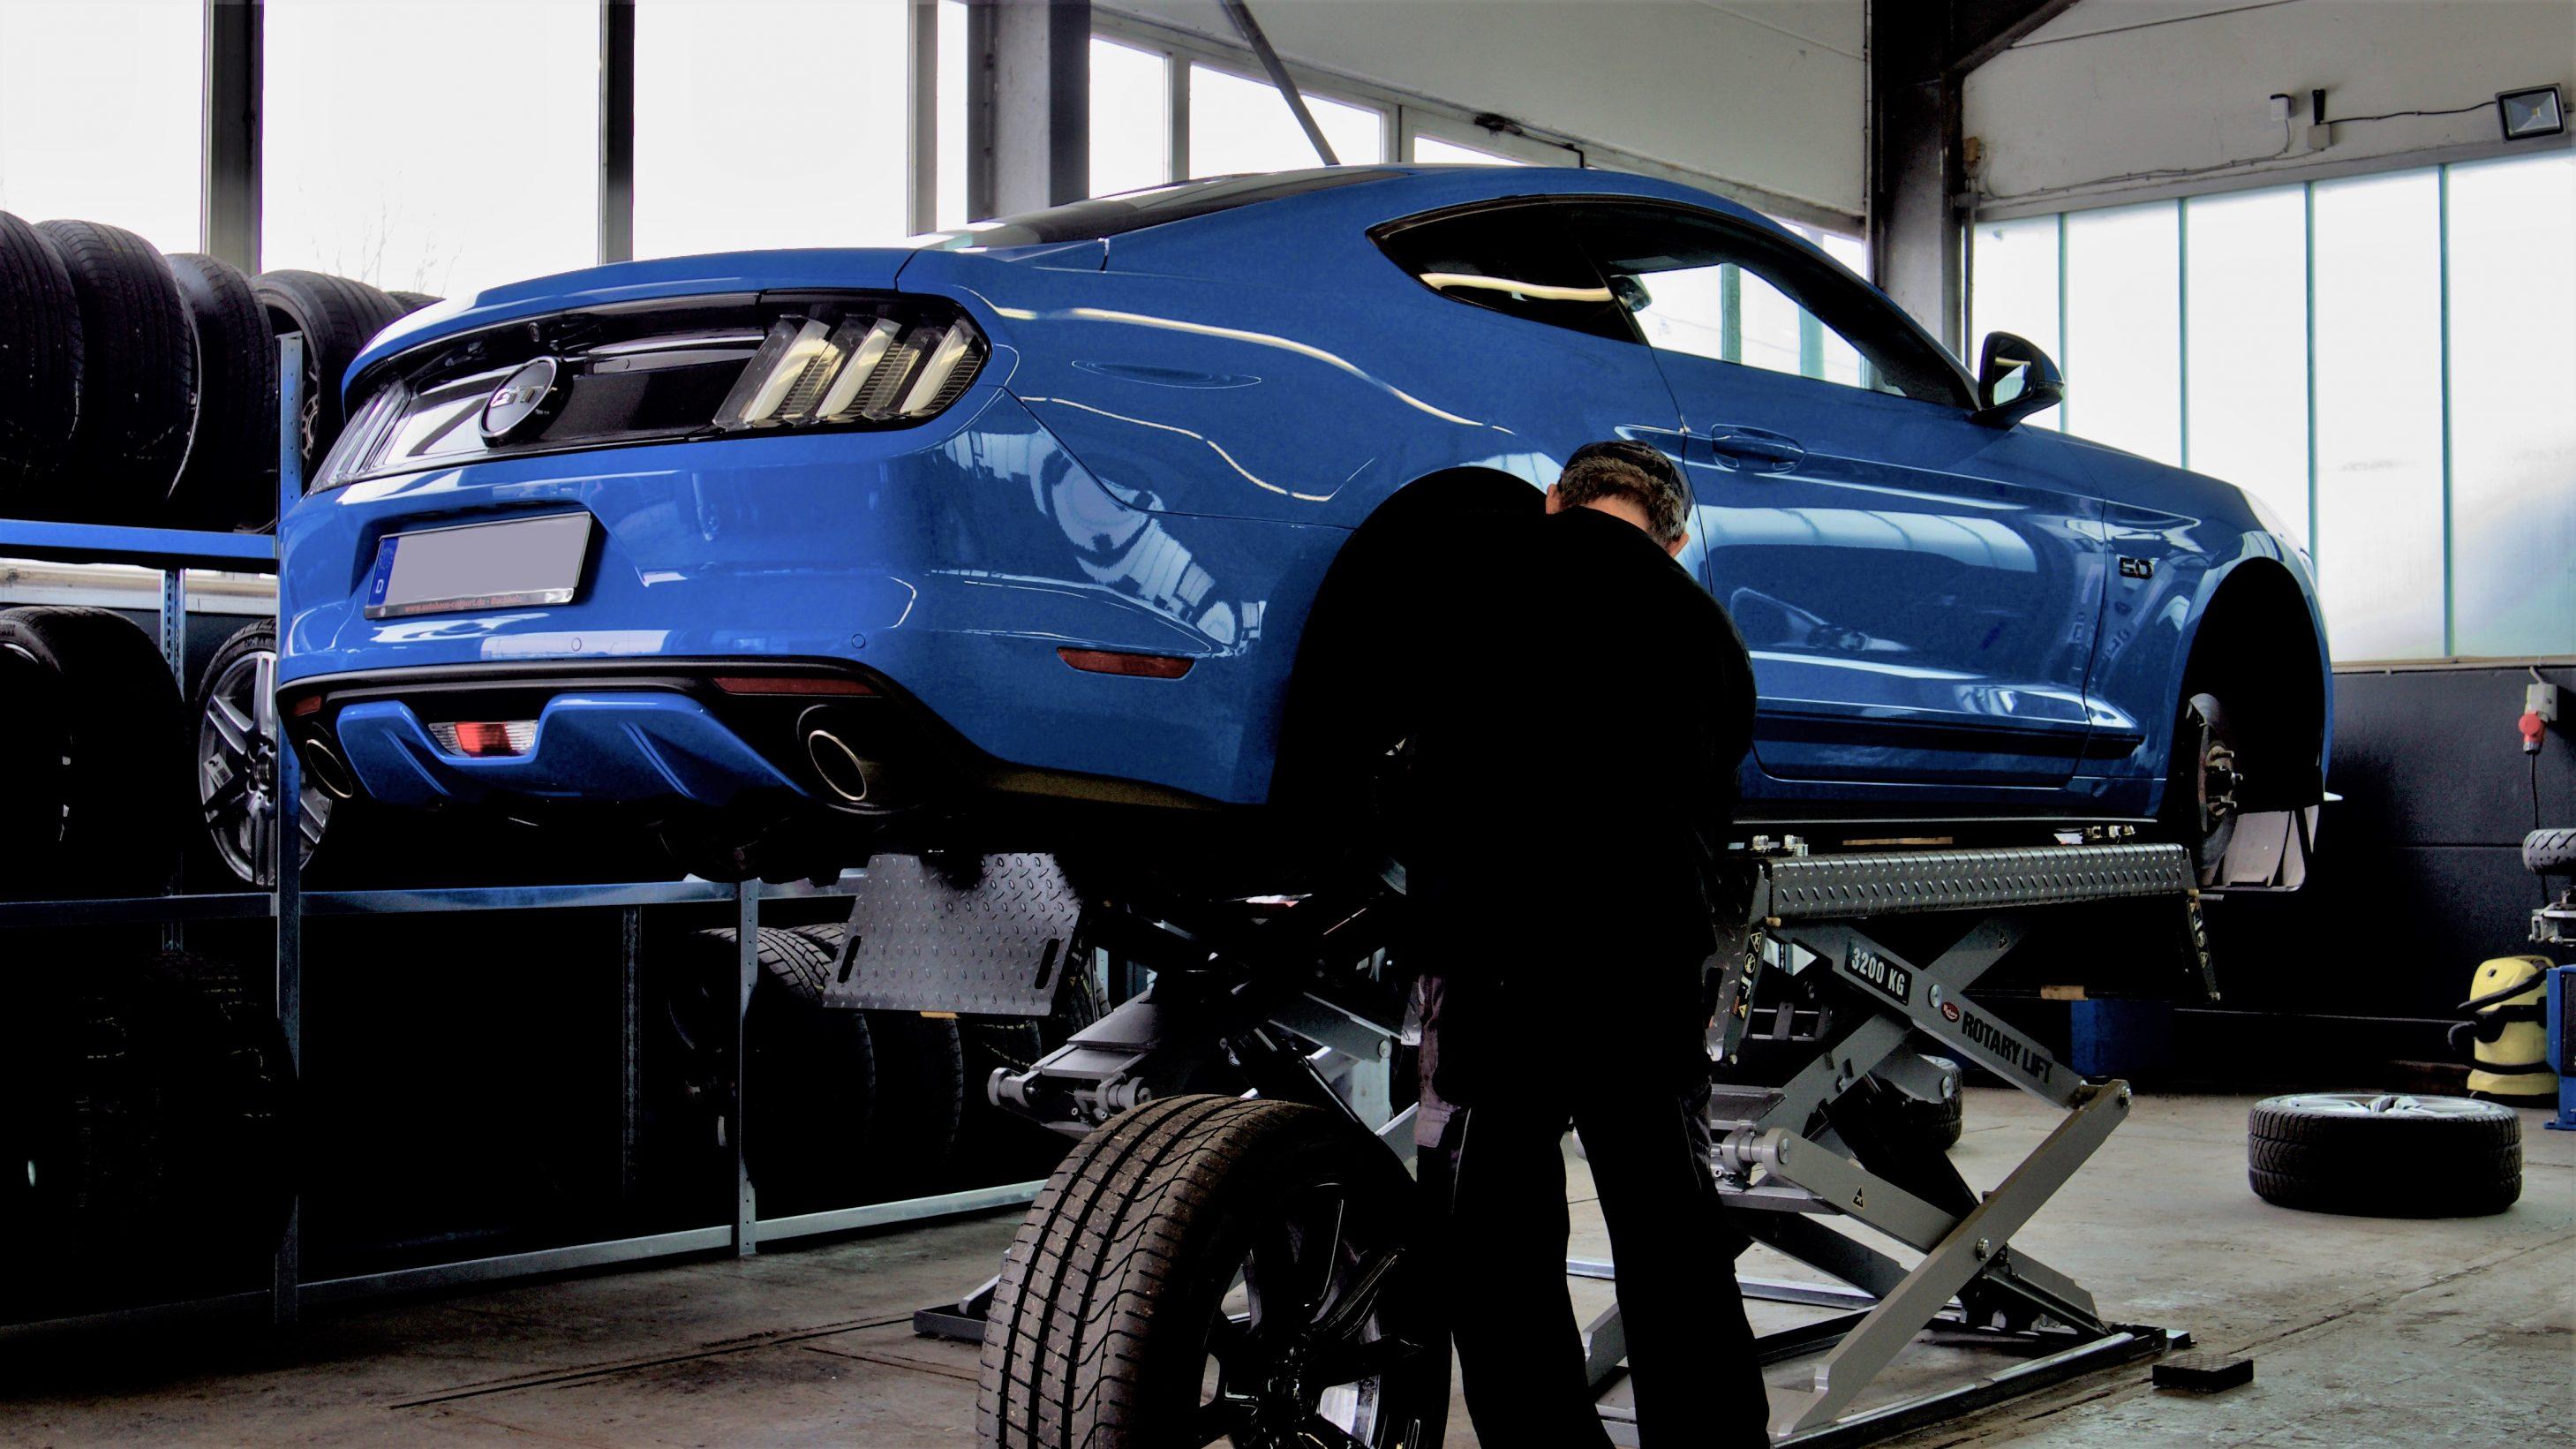 Räderservice CARPORT Buchholz